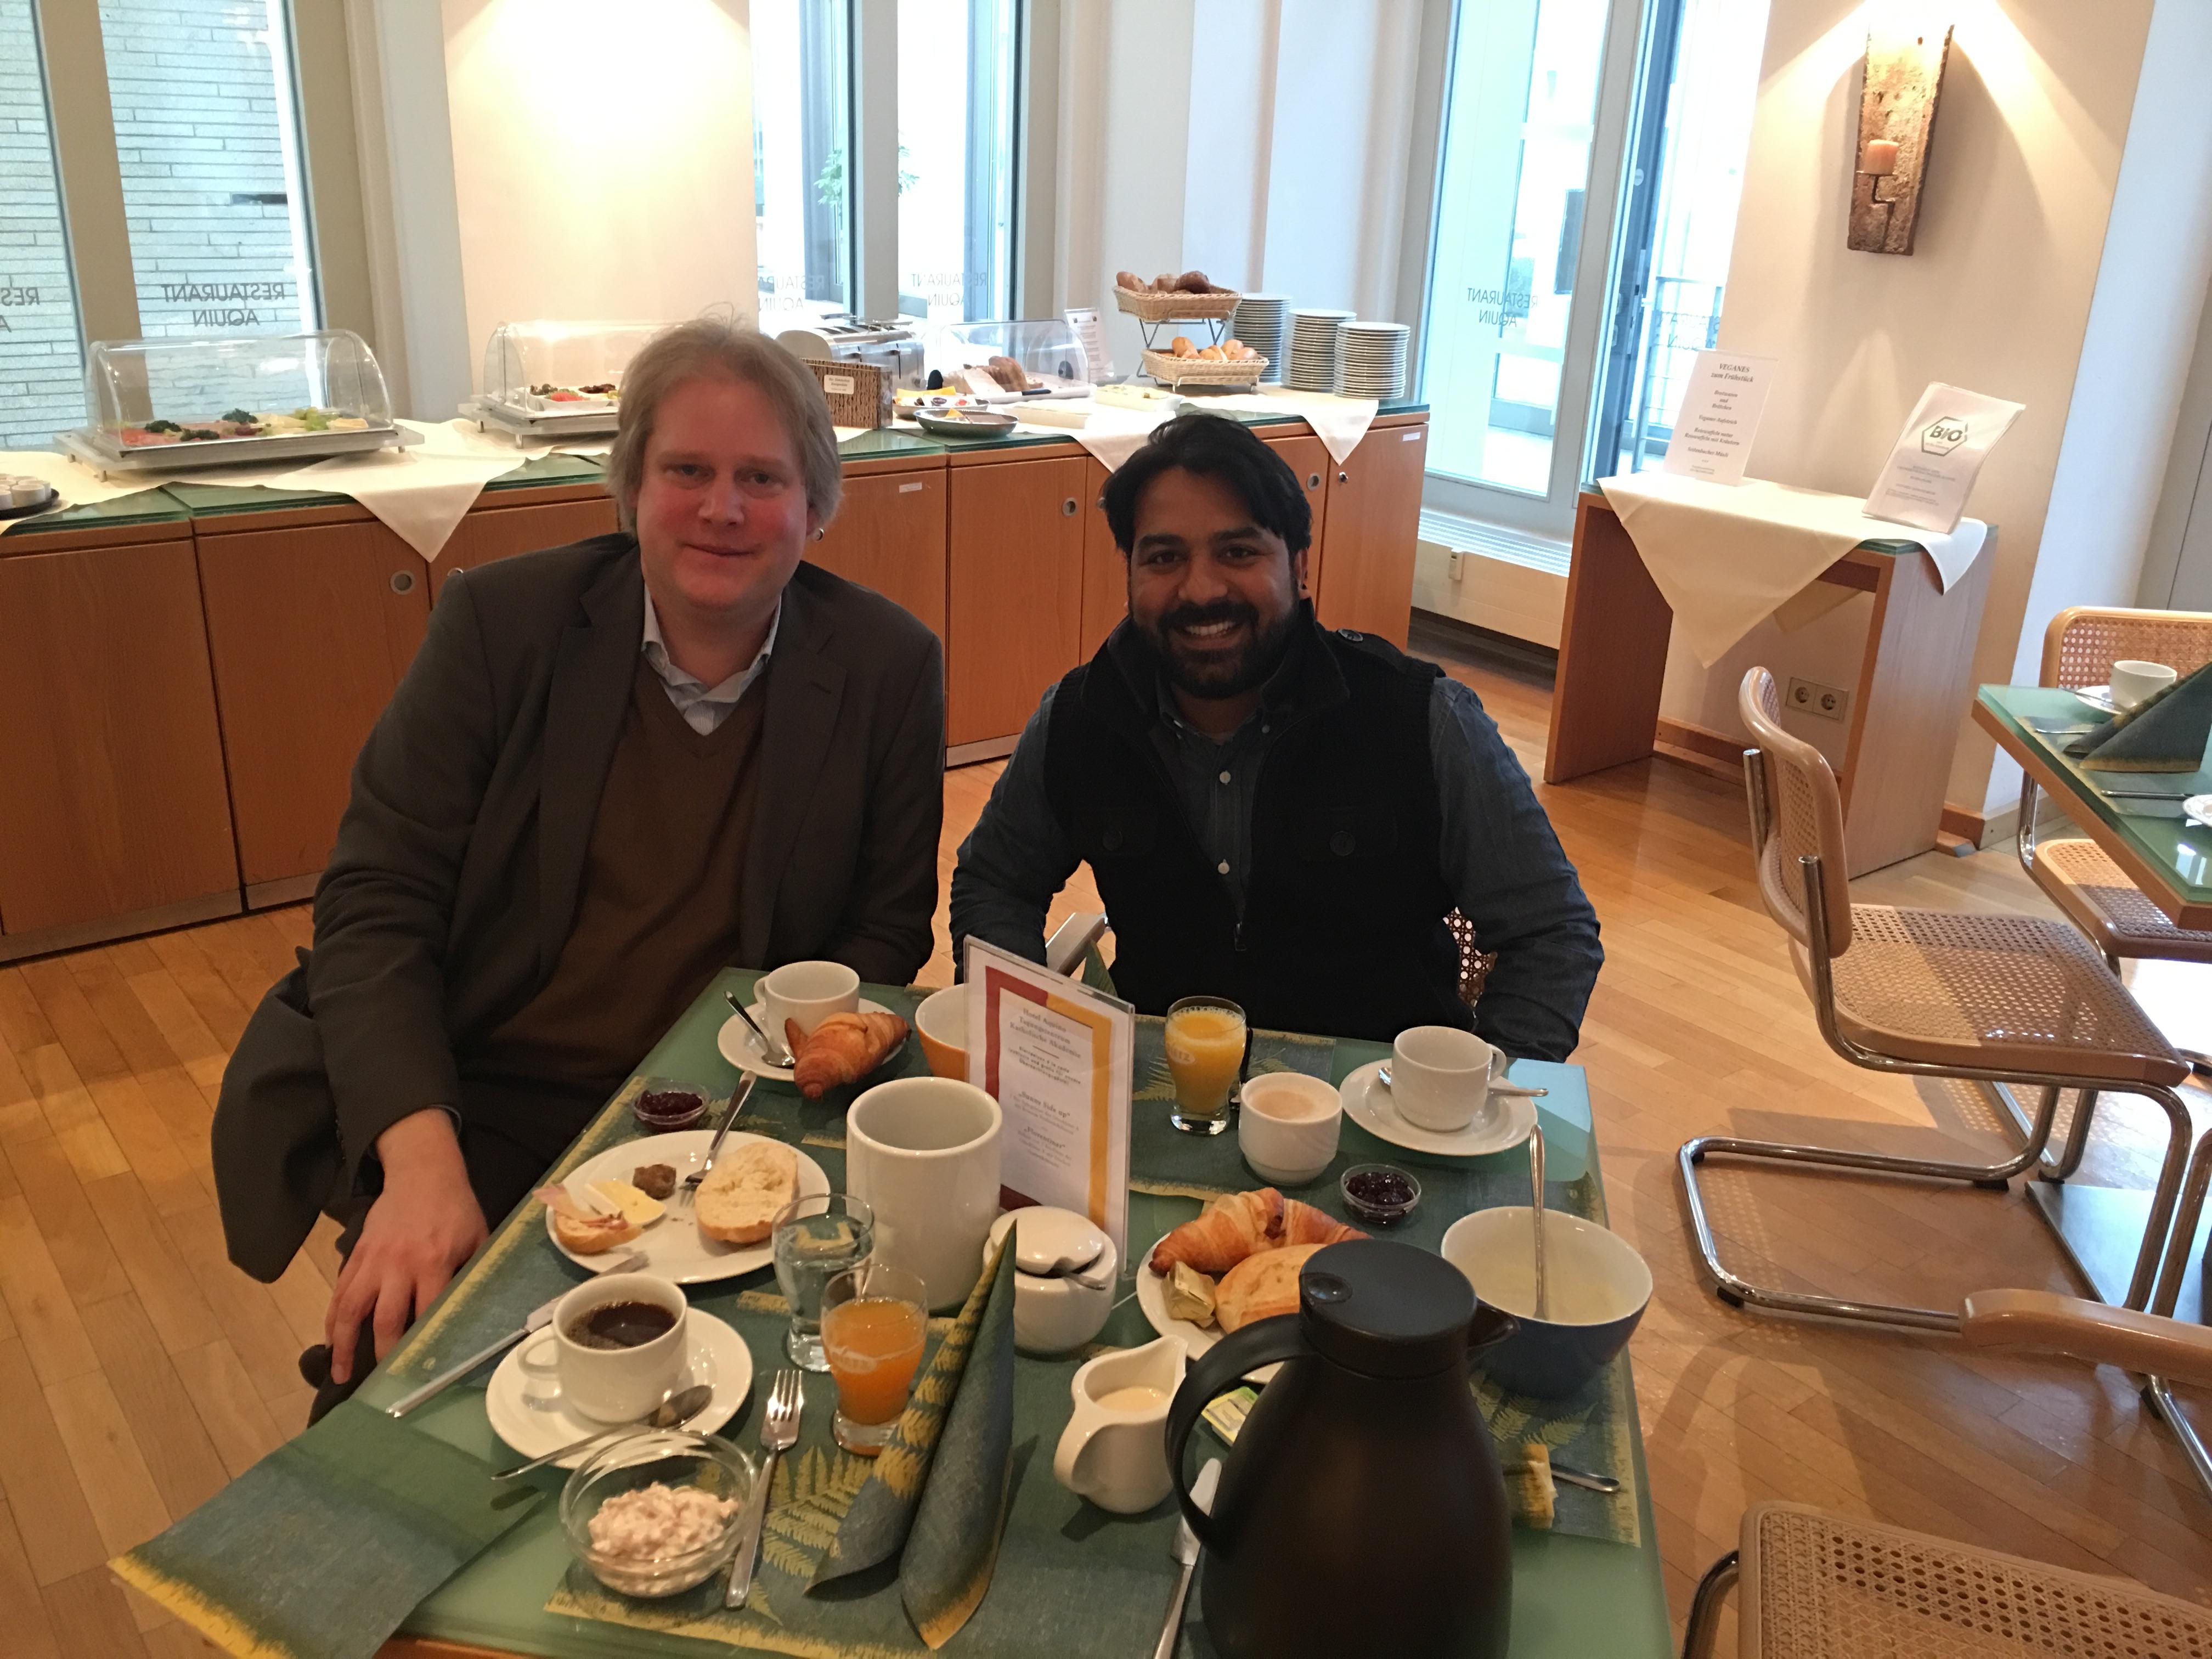 Meeting with Dr. Thomas Würtz (Catholic Academy in Berlin)